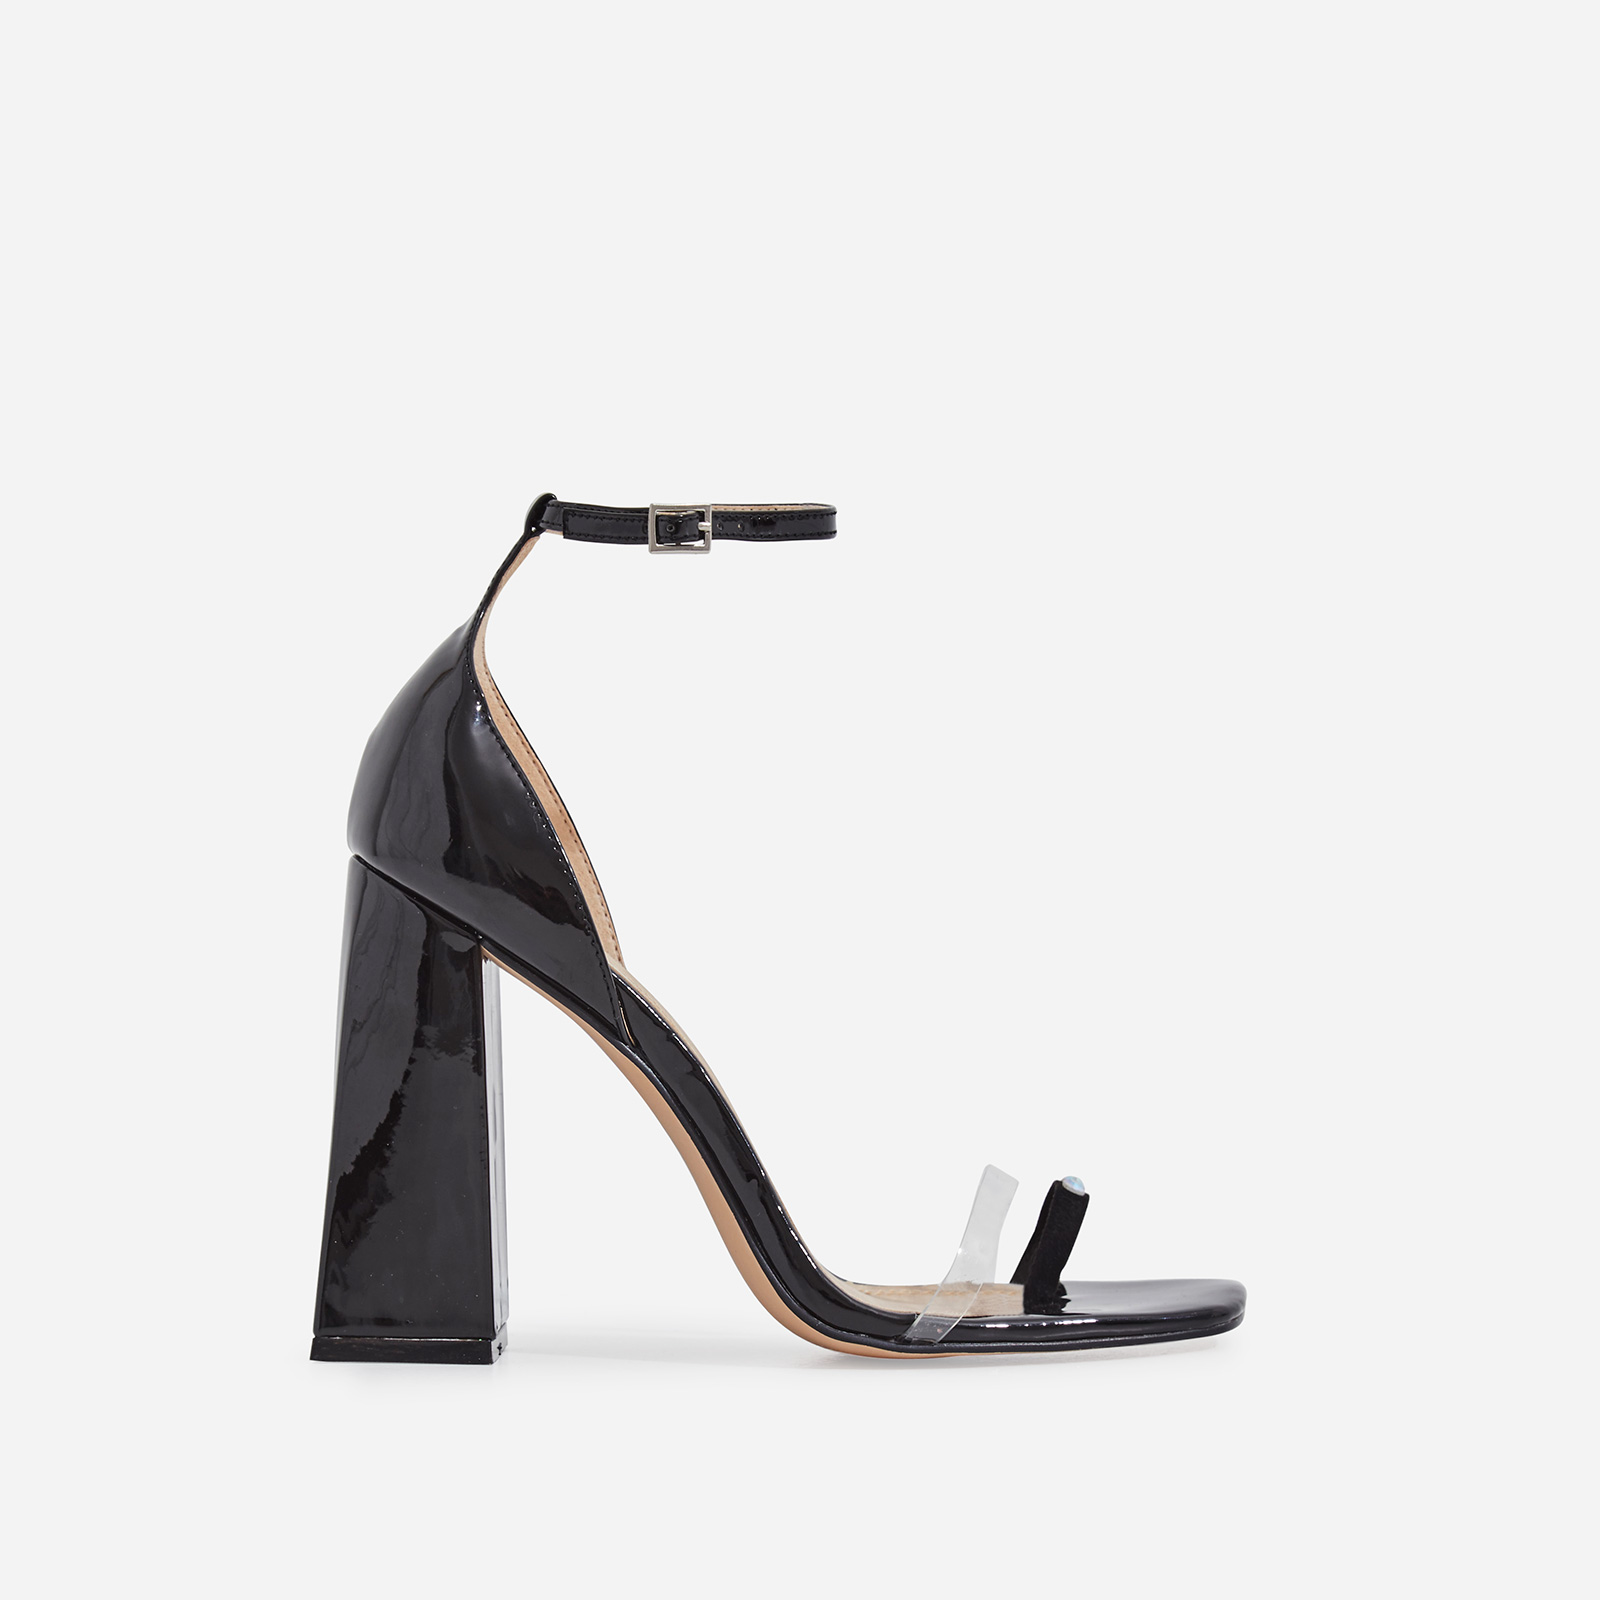 Perch Diamante Detail Strap Square Toe Perspex Flared Block Heel In Black Patent